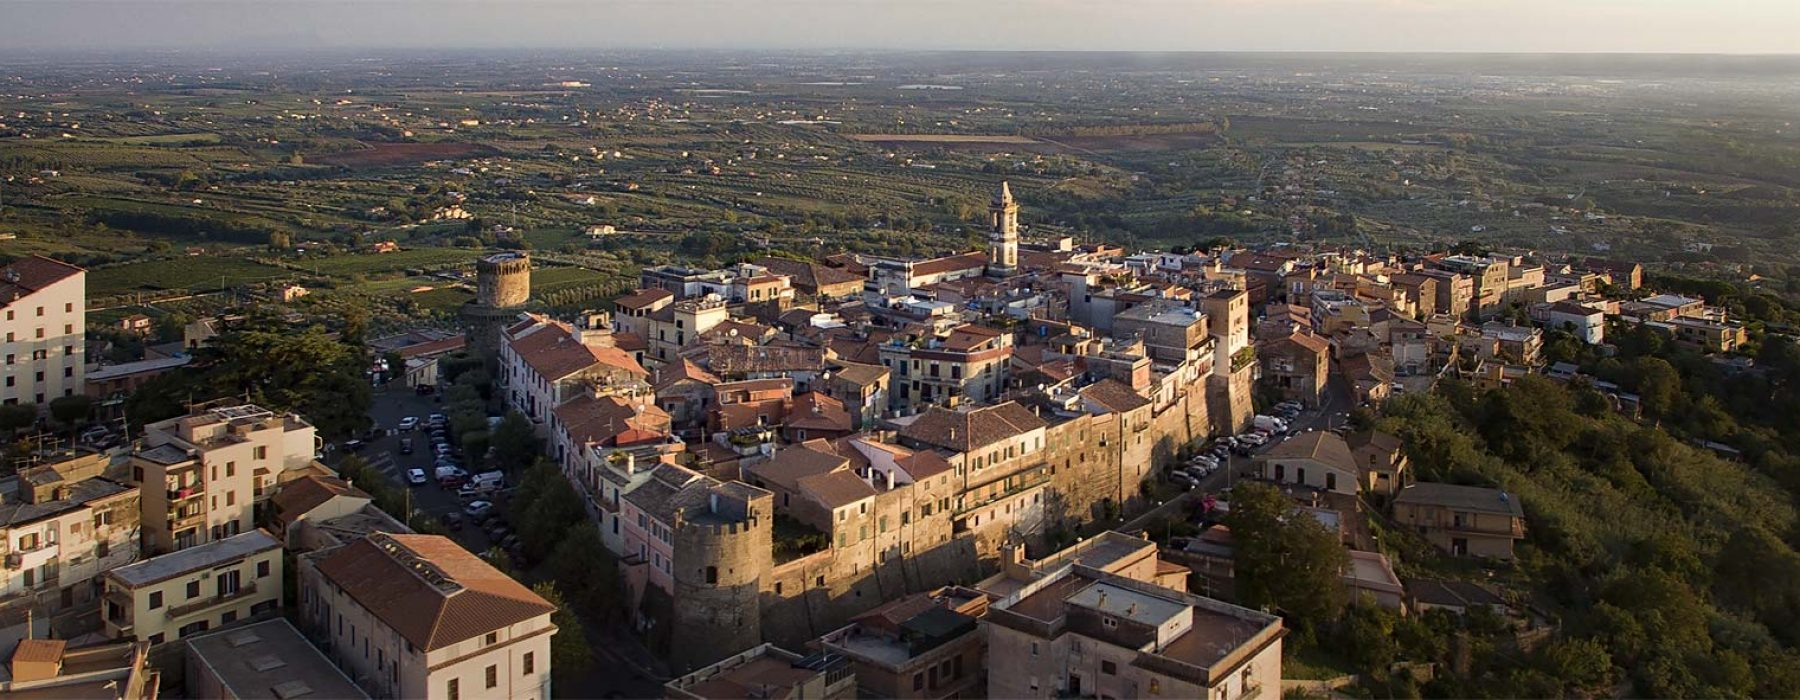 "Lanuvio ، لؤلؤة ""القلاع الرومانية"" ، بين التاريخ والأسطورة"